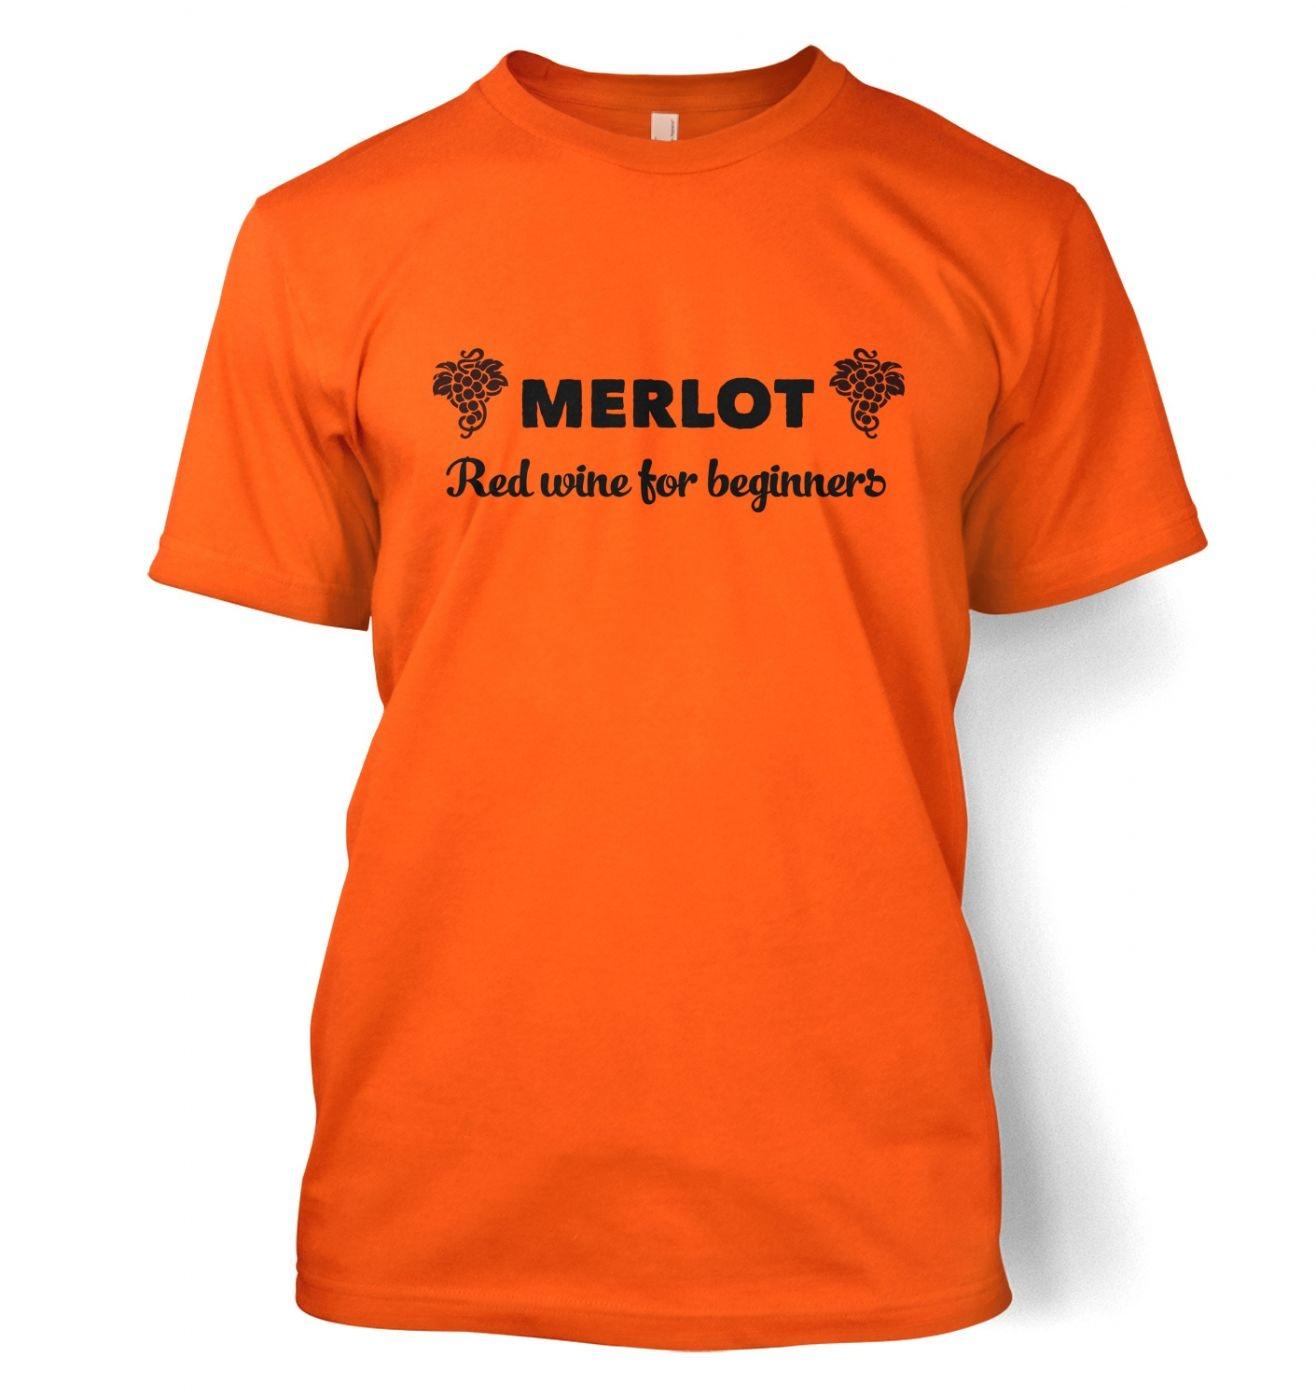 Merlot Red Wine For Beginners t-shirt - funny wine-lovers' tshirt